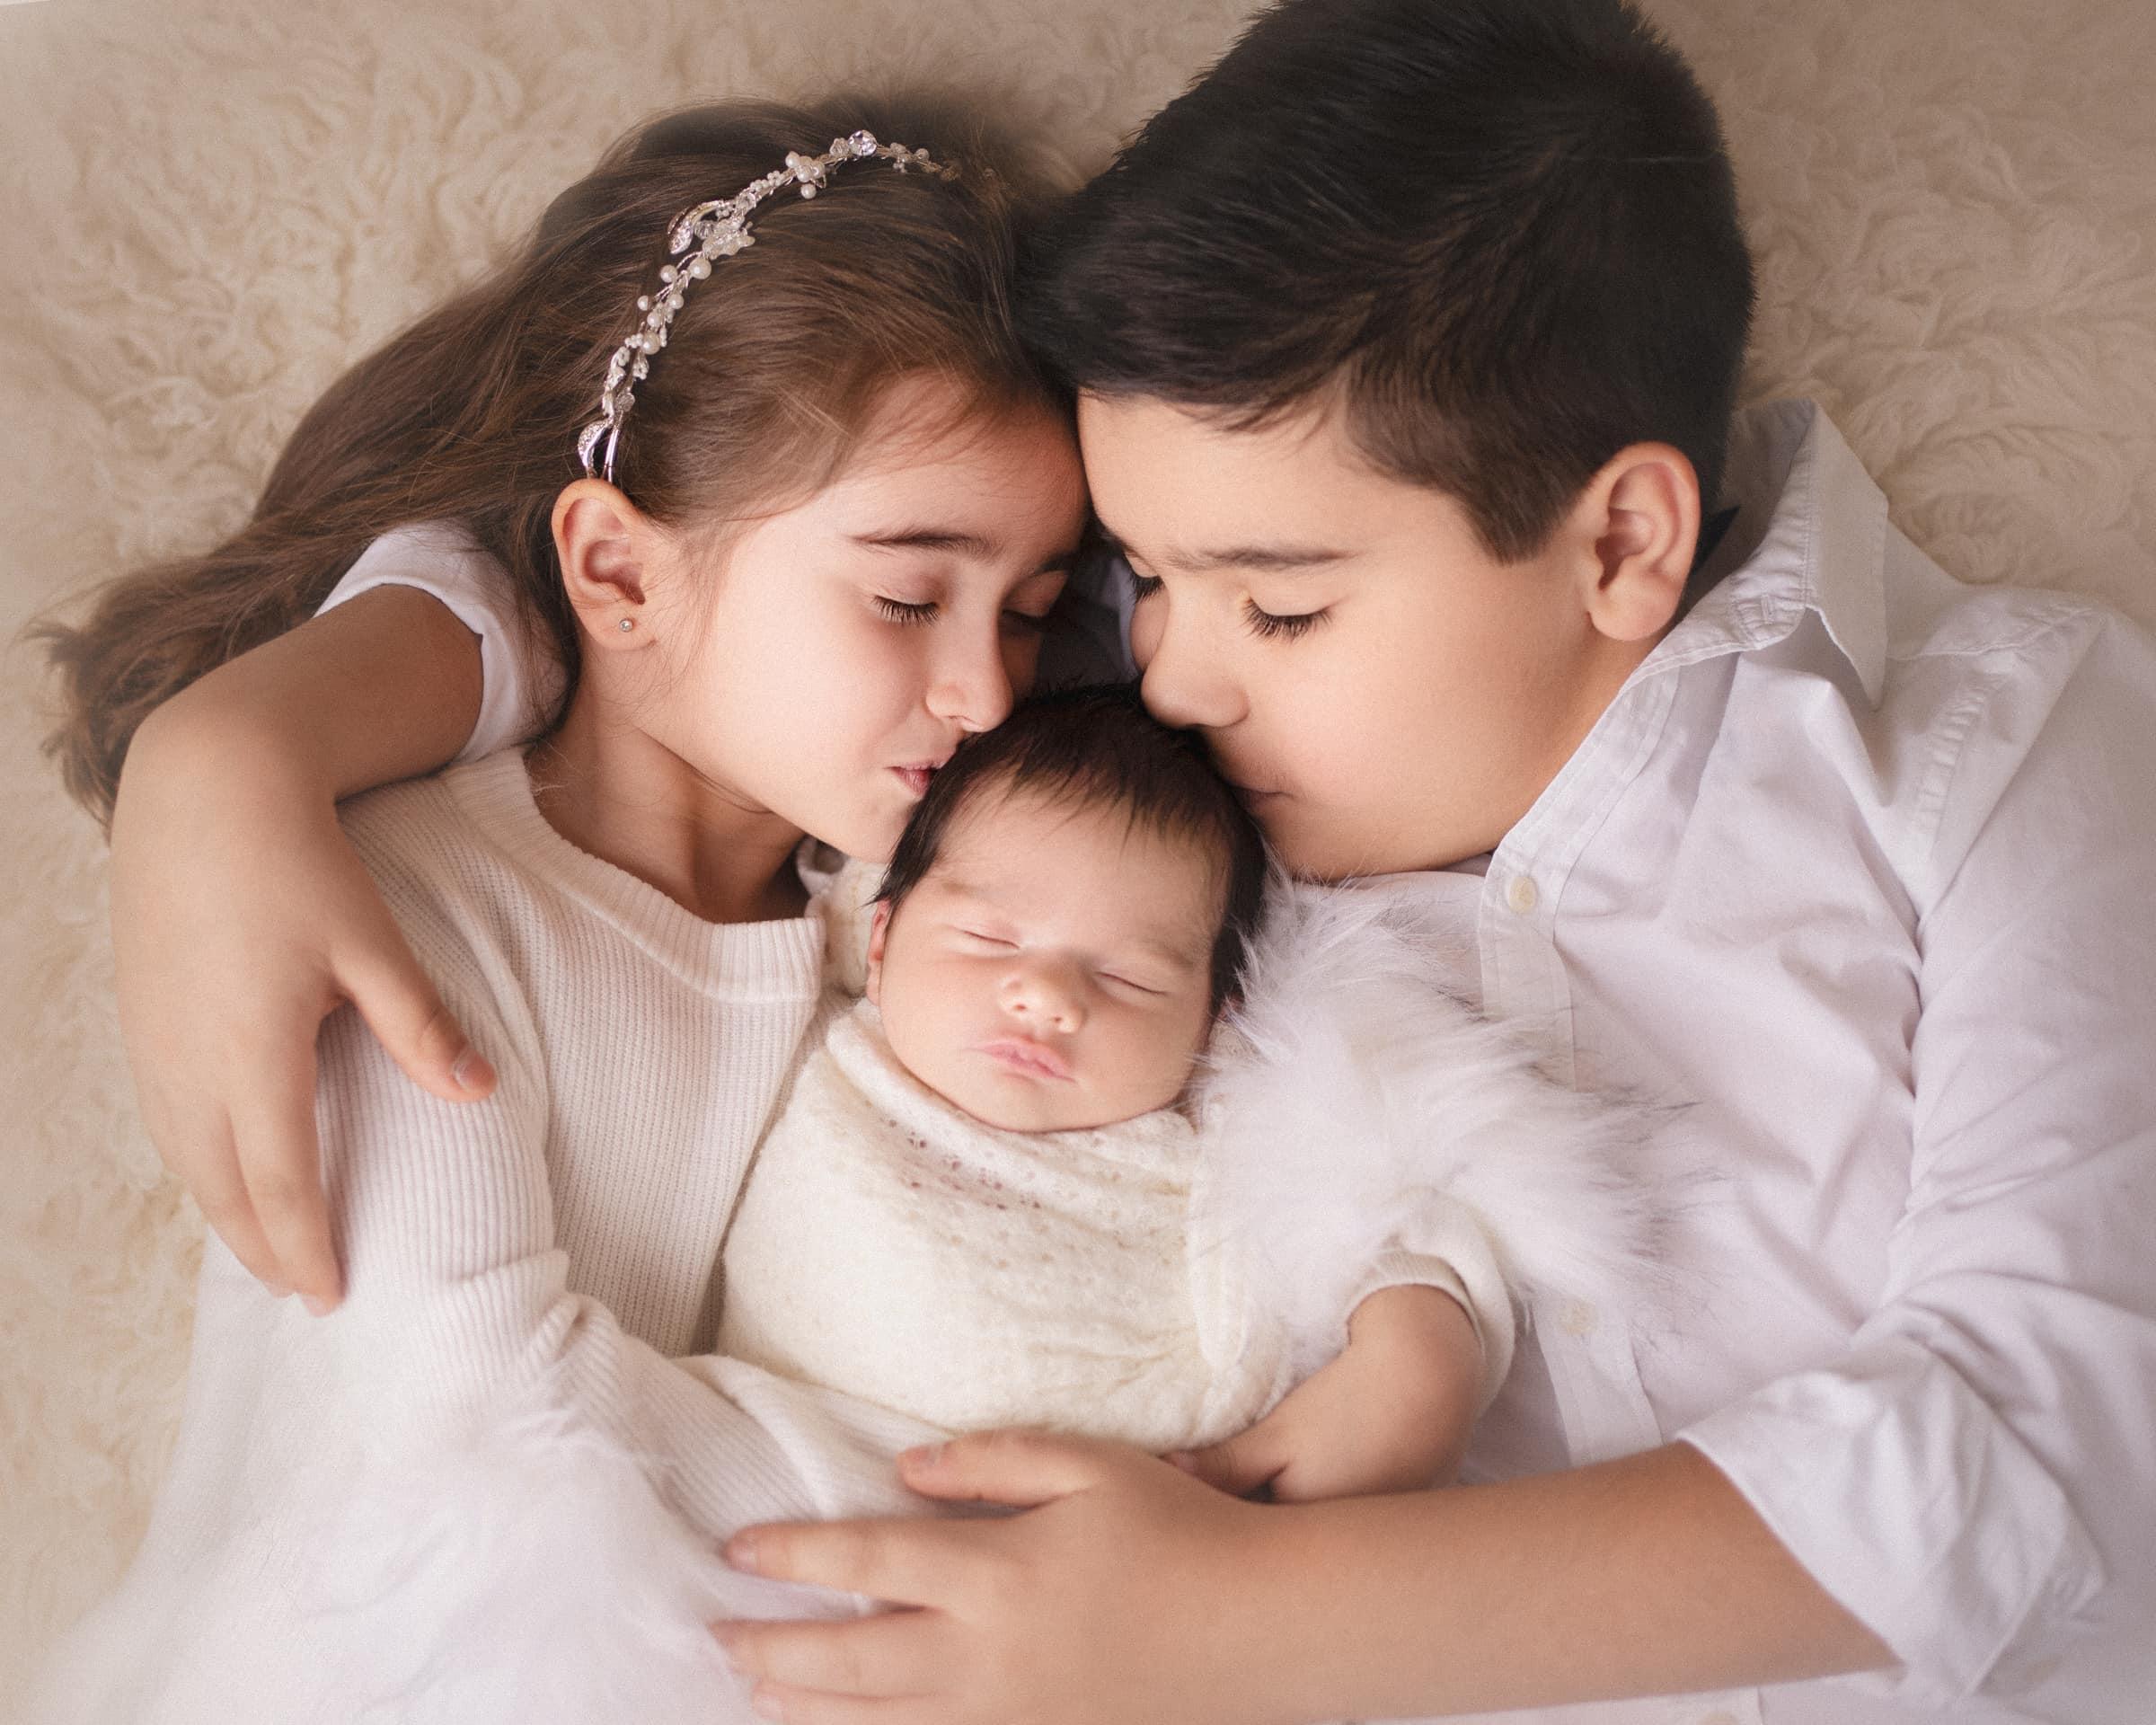 Carol-1 baby carol - raleigh newborn photographer